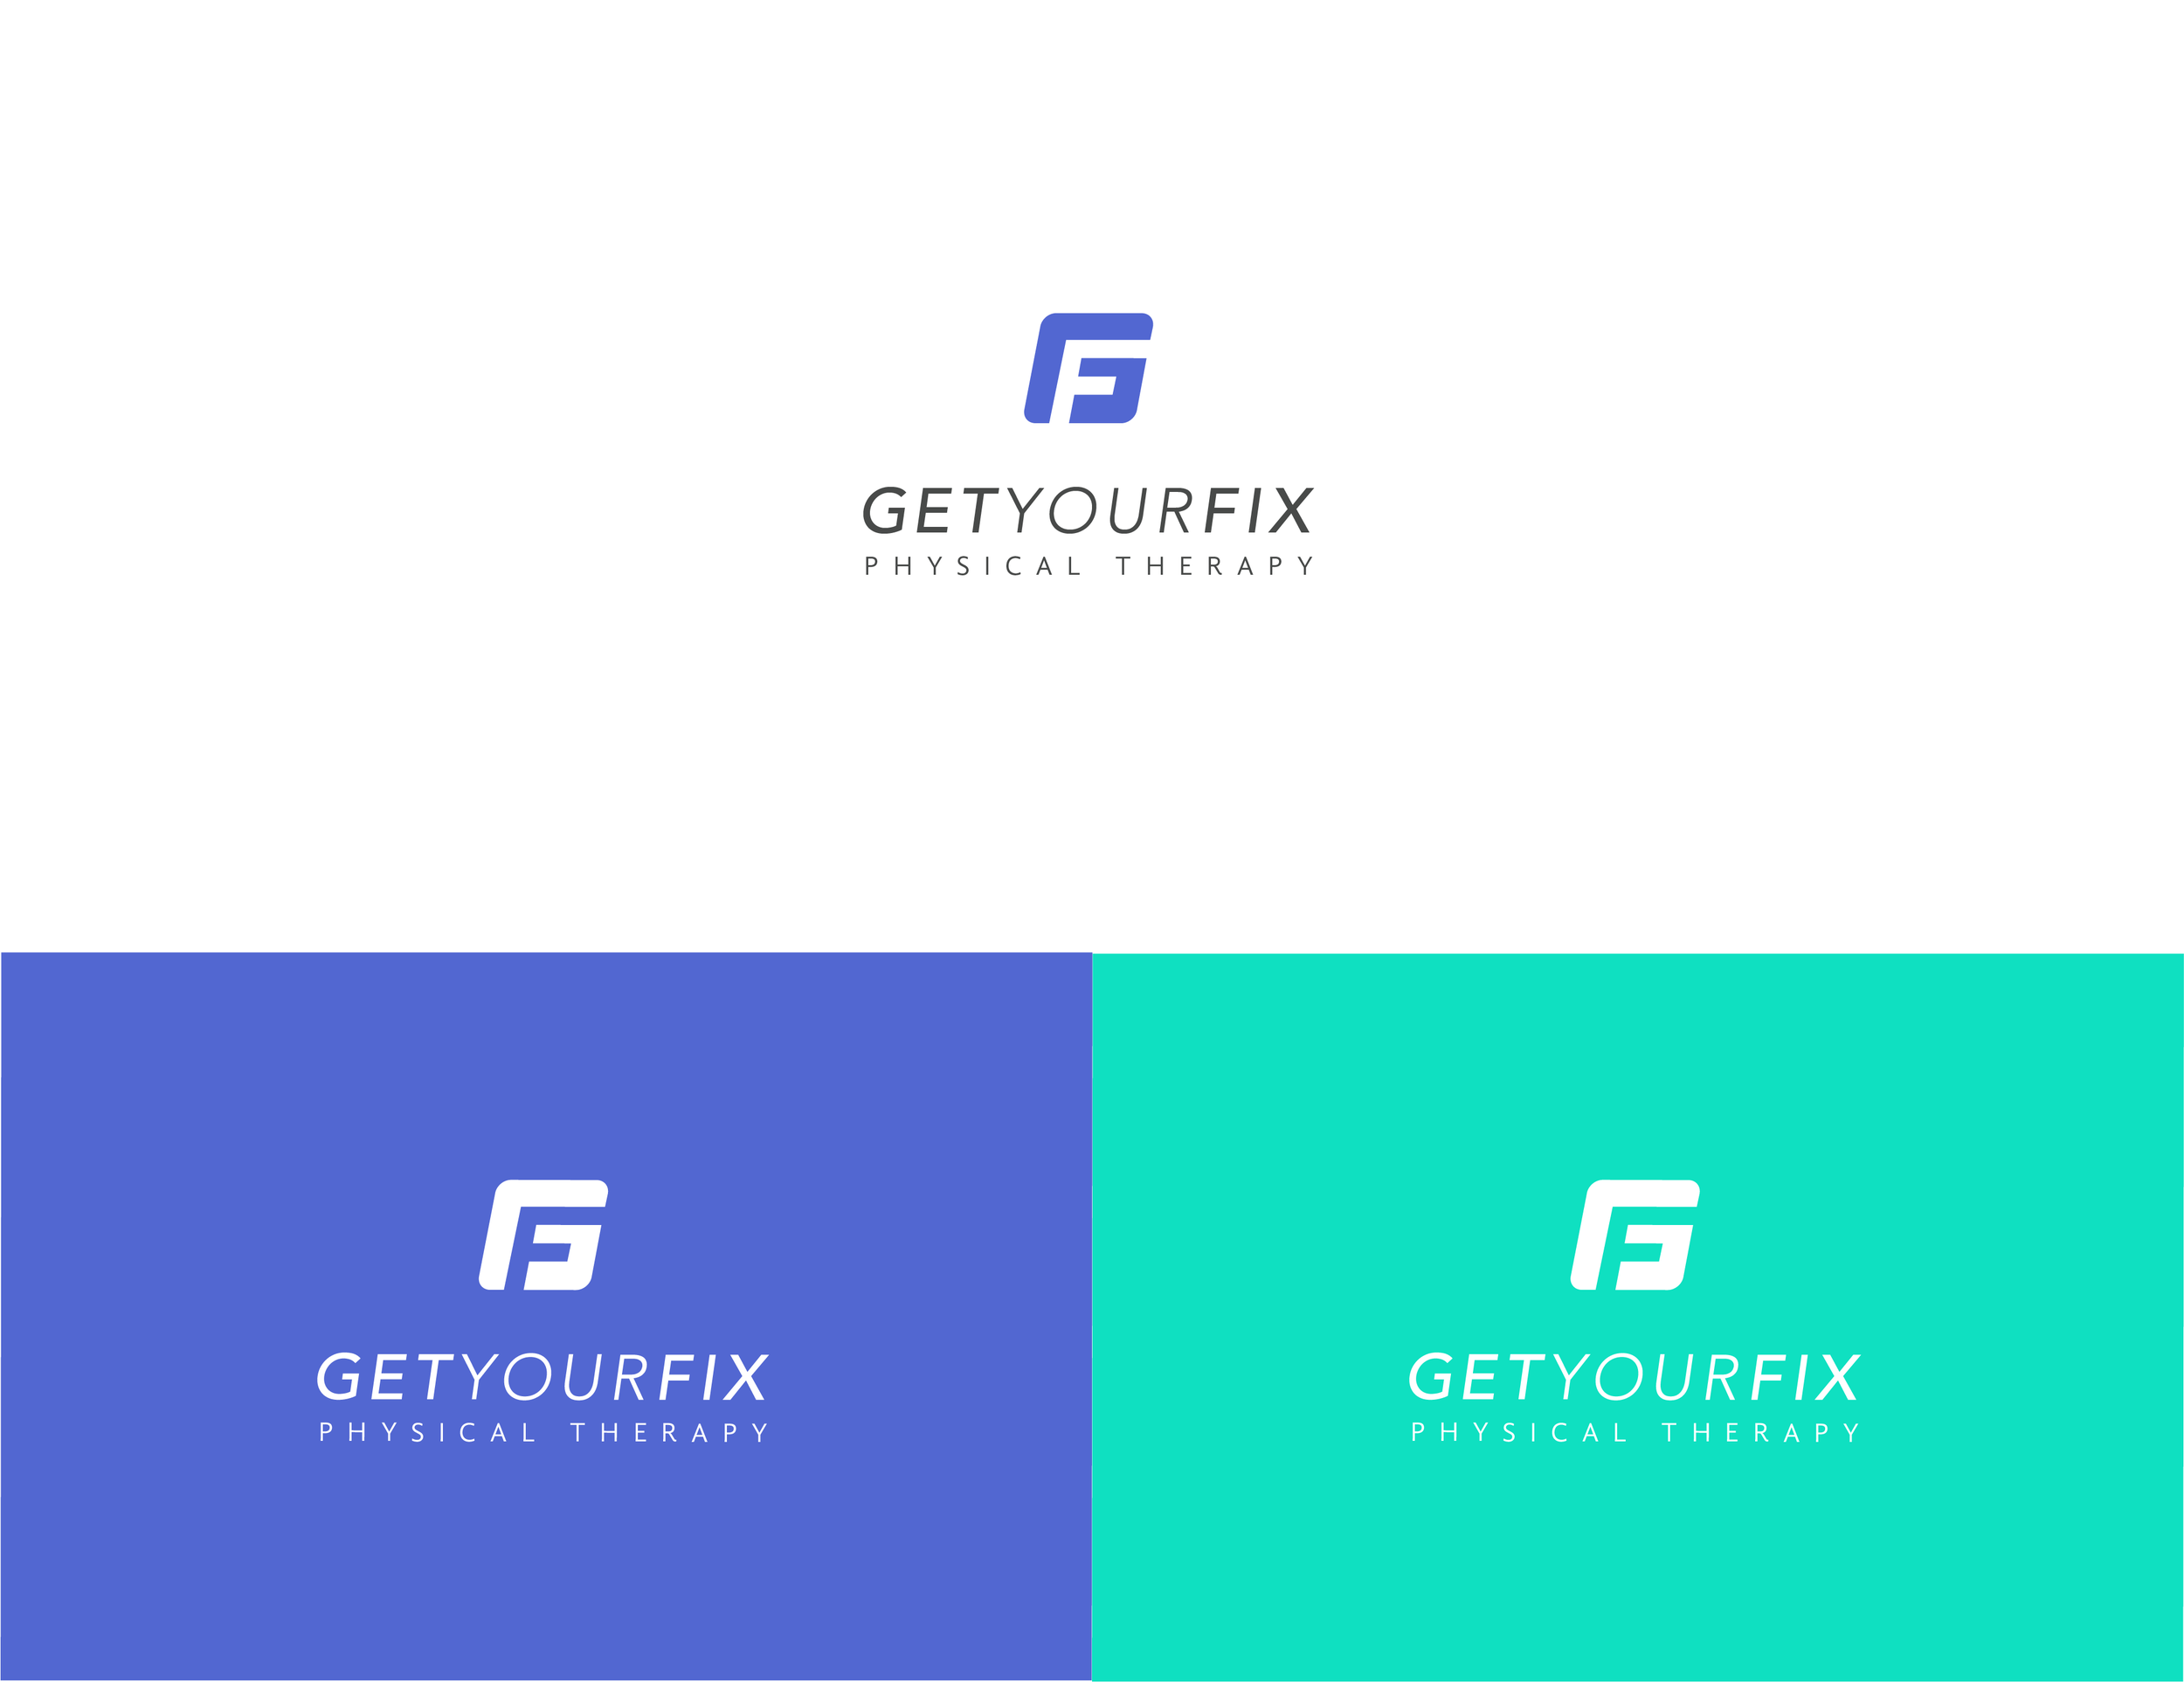 Getyourfix-logo-04.png